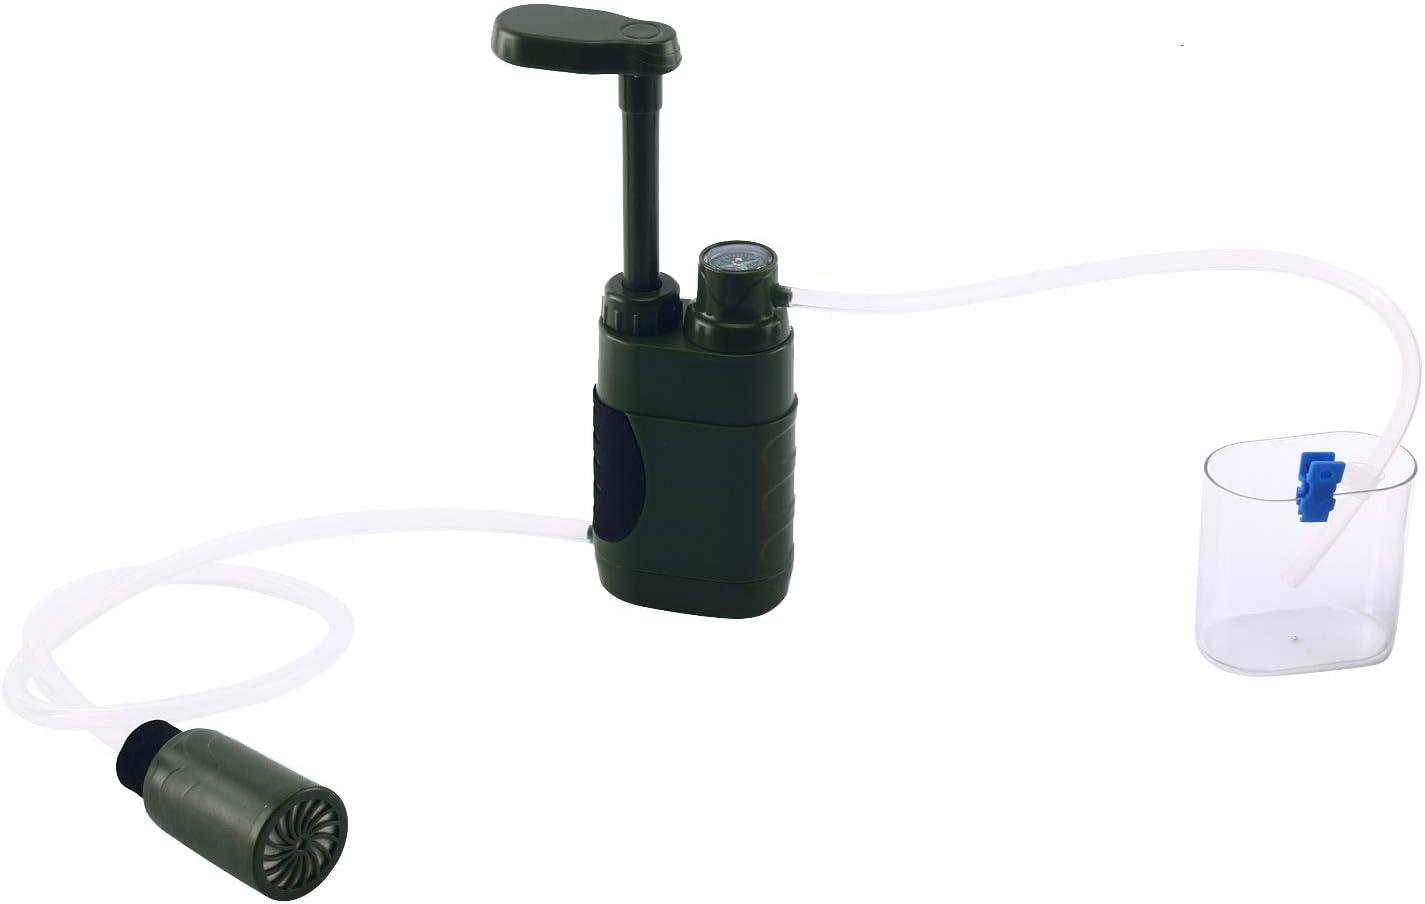 Amarine-made Wasserfilter Outdoor Armee Gr/ün Portable Notfall-Personal Wandern Camping Wasser Filter Wasserreiniger Tischwasserfilter Wasseraufbereitung f/ür Reise Outdoor-Aktivit/ät